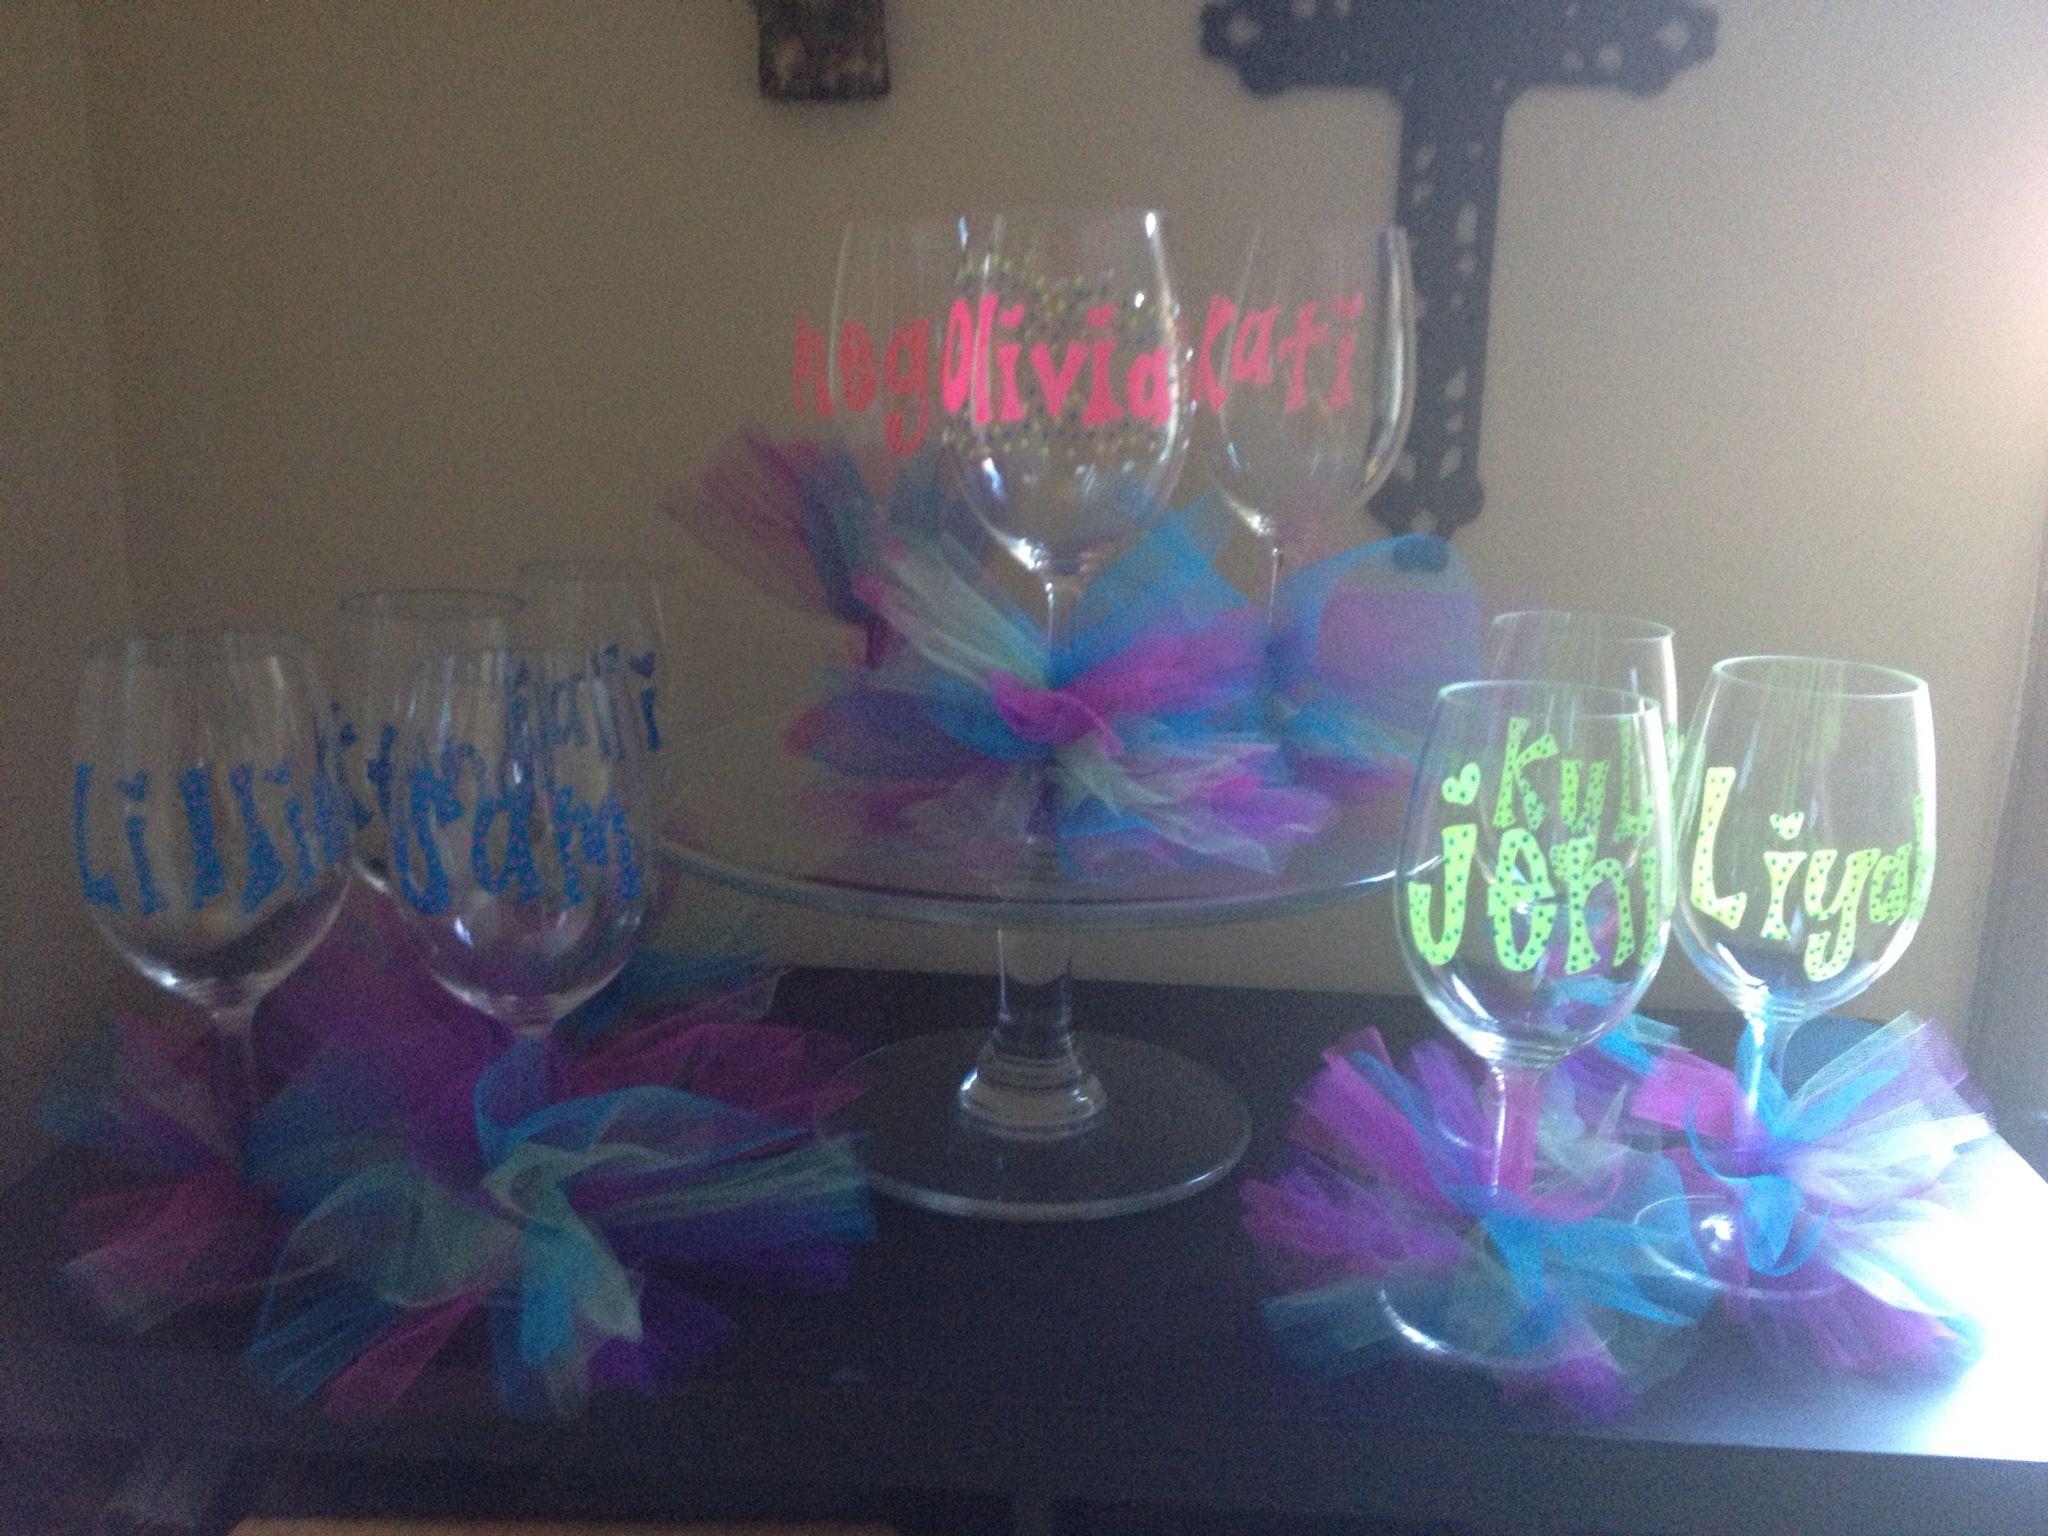 Pin By Meg Koren On Adventures In Motherhood Tutu Birthday Party Crafty Gifts Ring Bearer Flower Girl